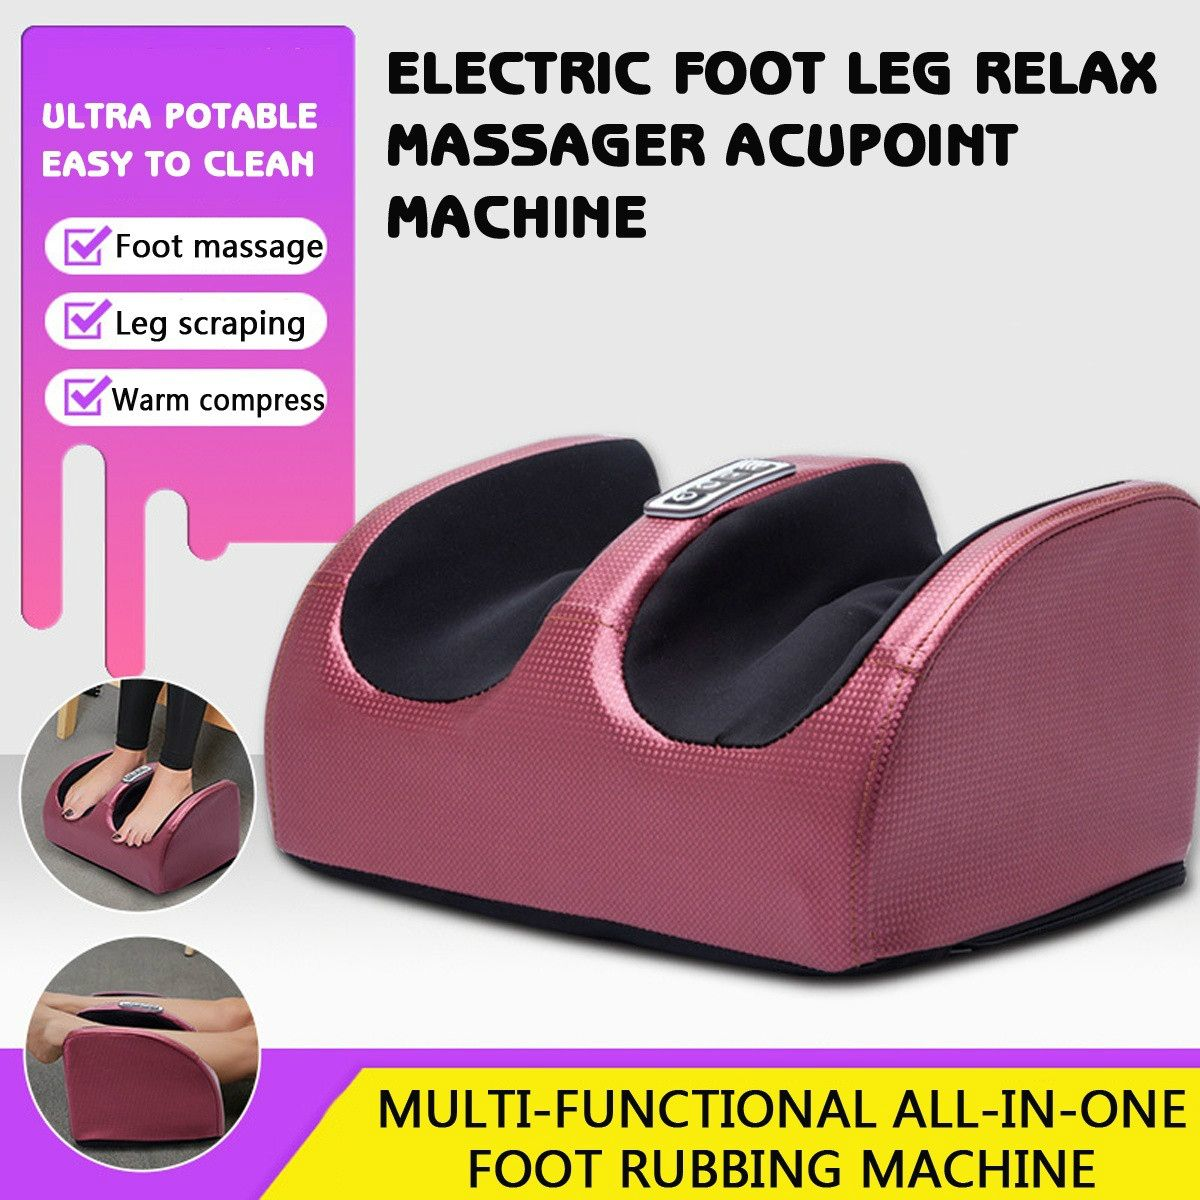 6-in-1 Electric Foot Massager Shiatsu Kneading Foot Calf Leg Plantar Massager Infrared With Heating Roller Massage Machine